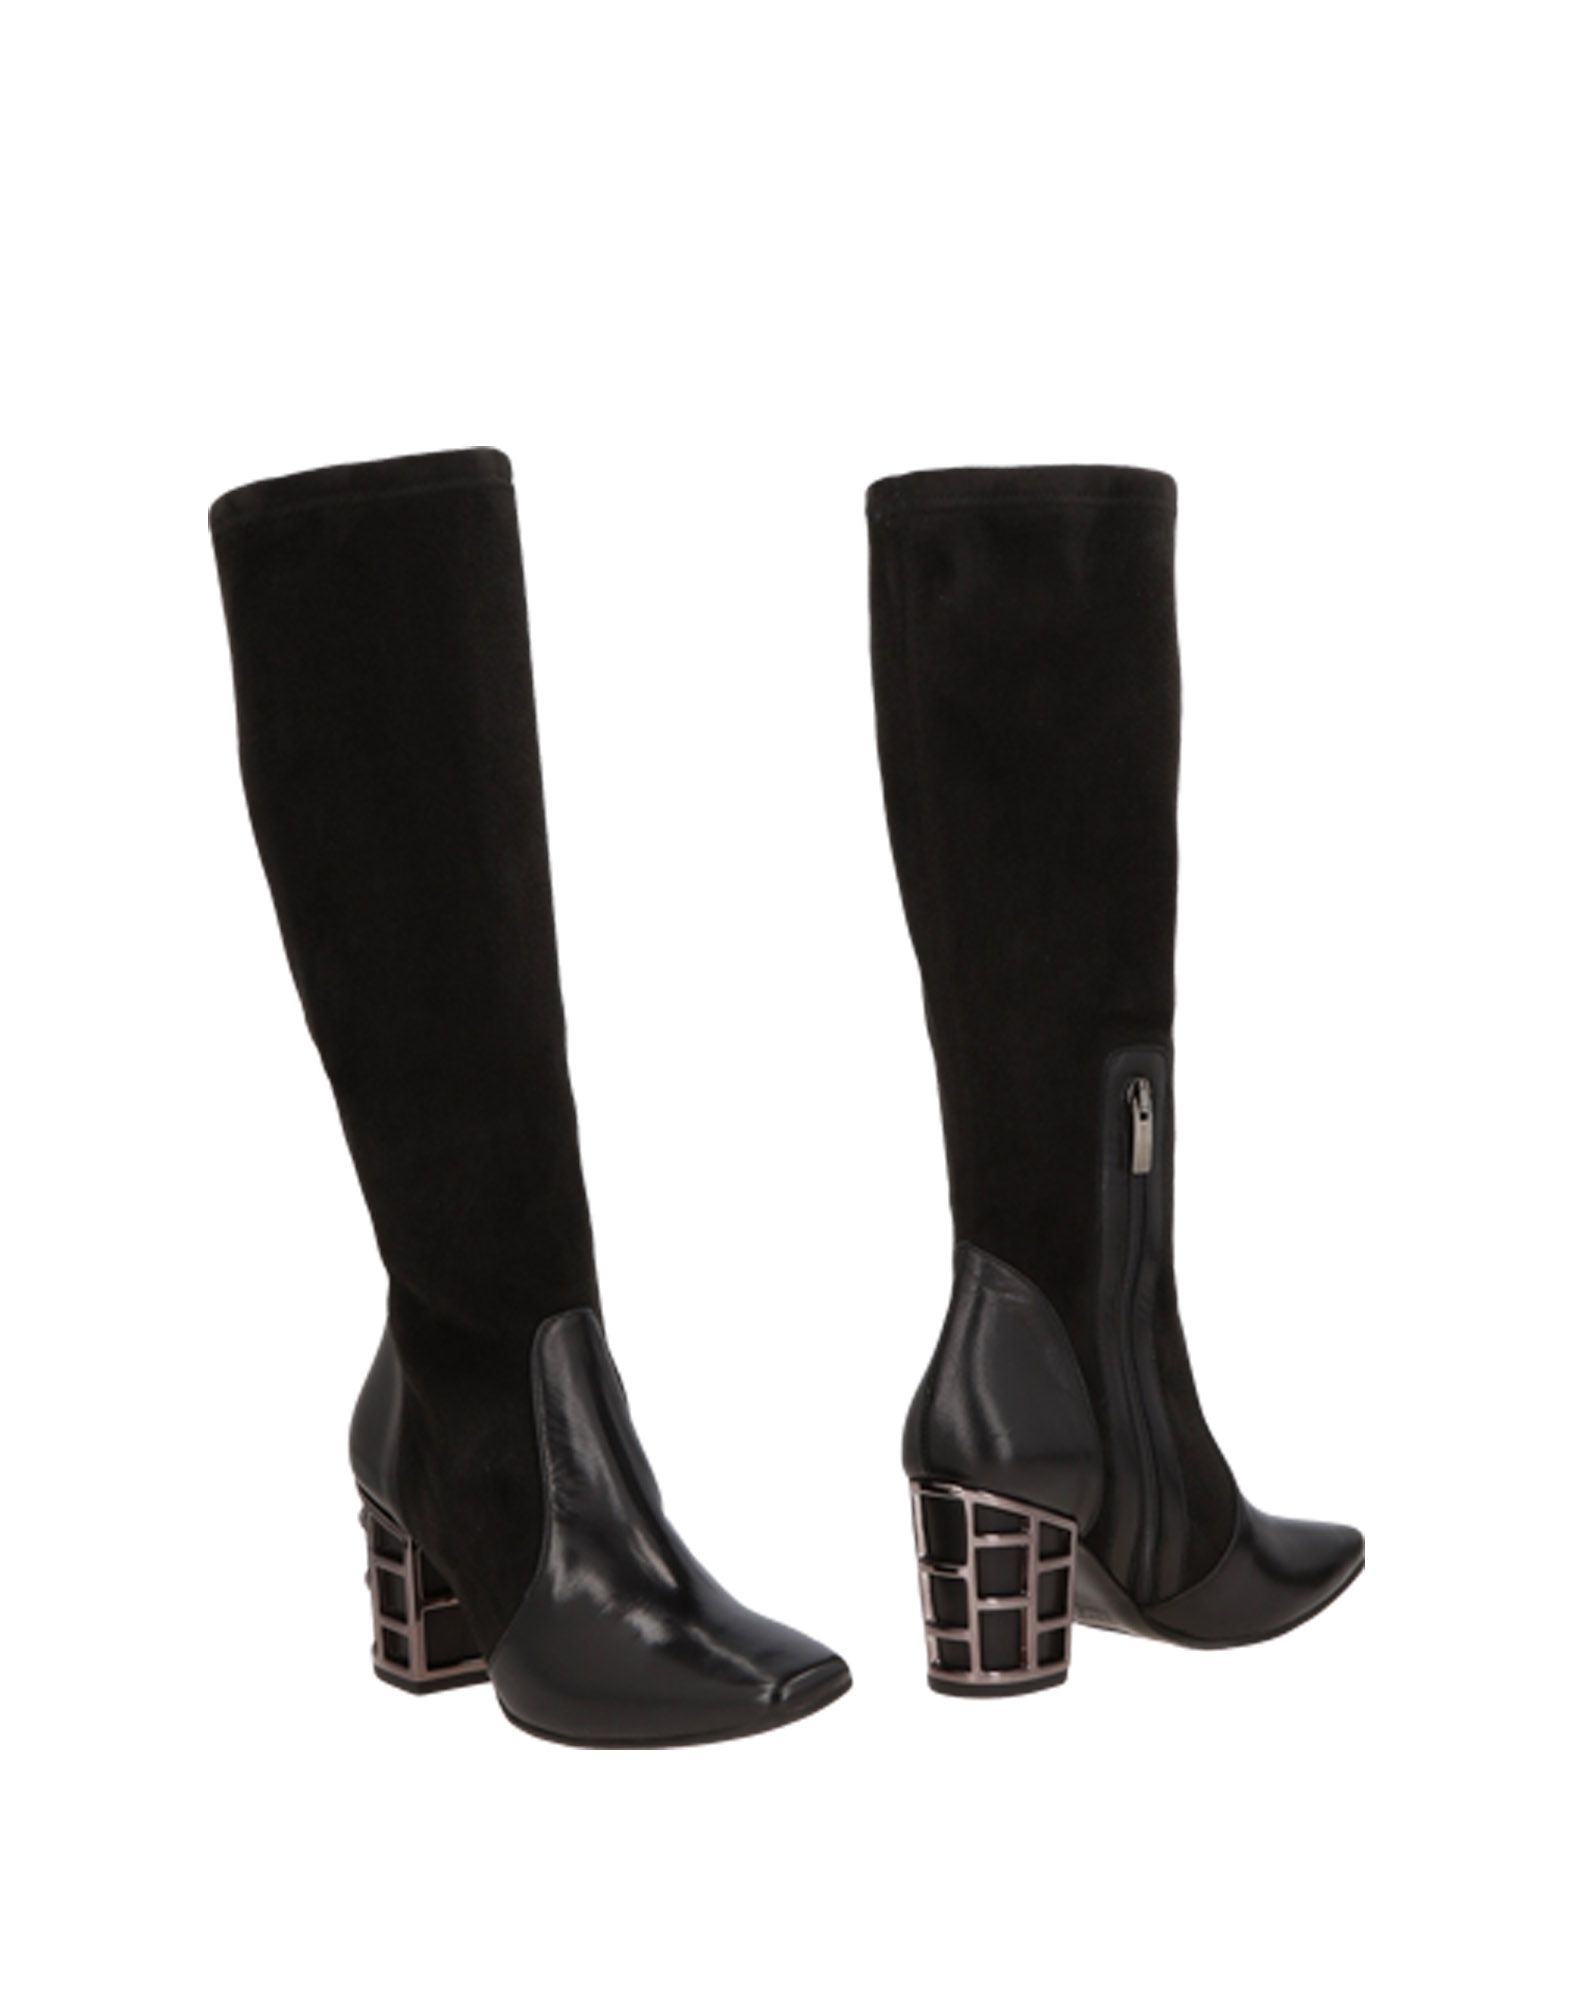 Nila & Nila Stiefel Damen  11473459USGut aussehende strapazierfähige Schuhe